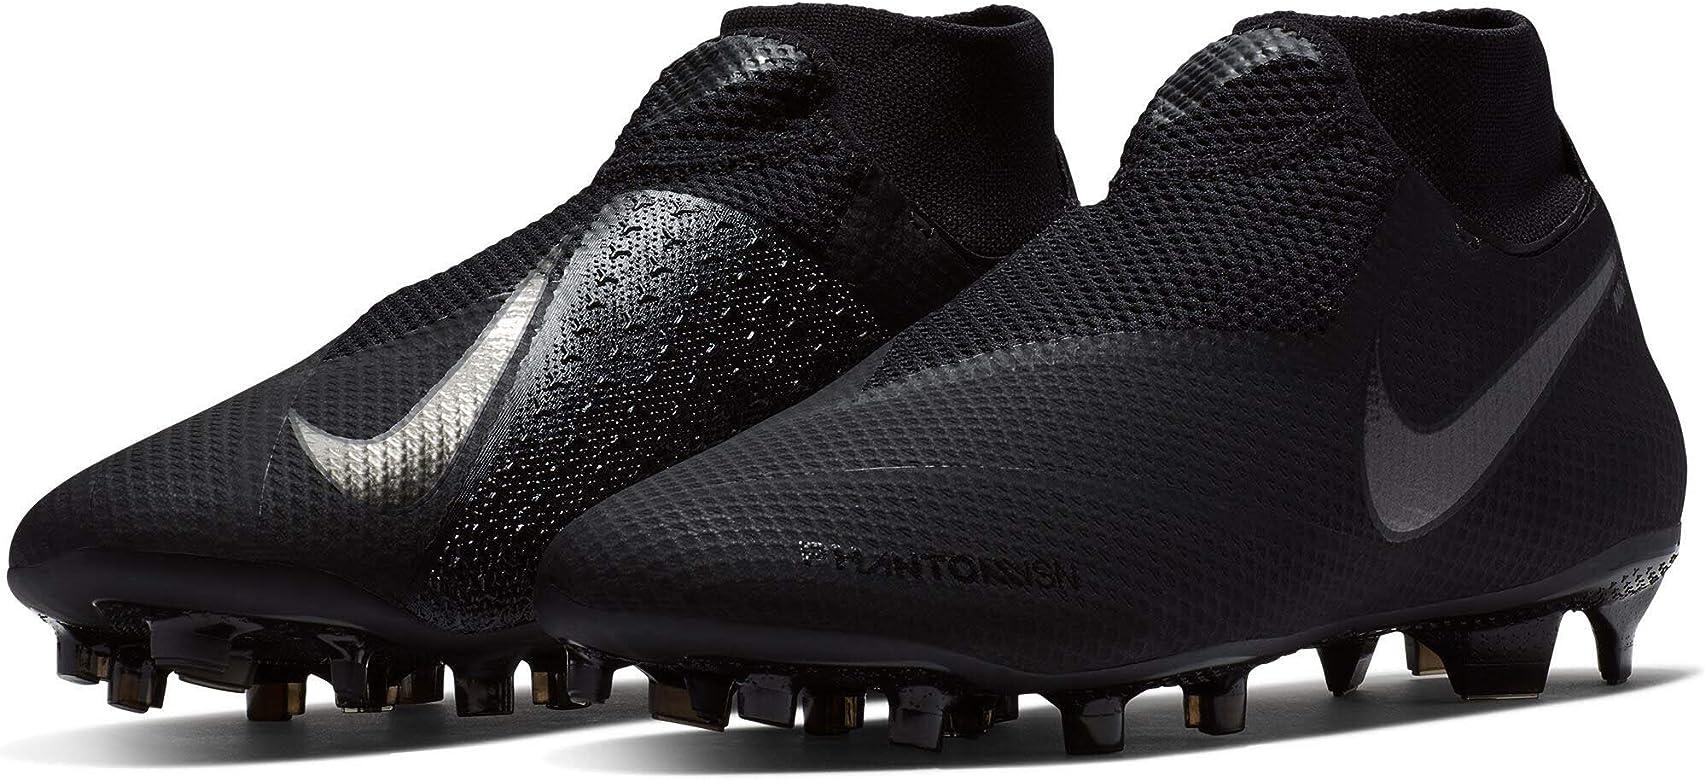 new style 12dd7 71e4e Phantom Vision Pro Men's Firm Ground Soccer Cleats